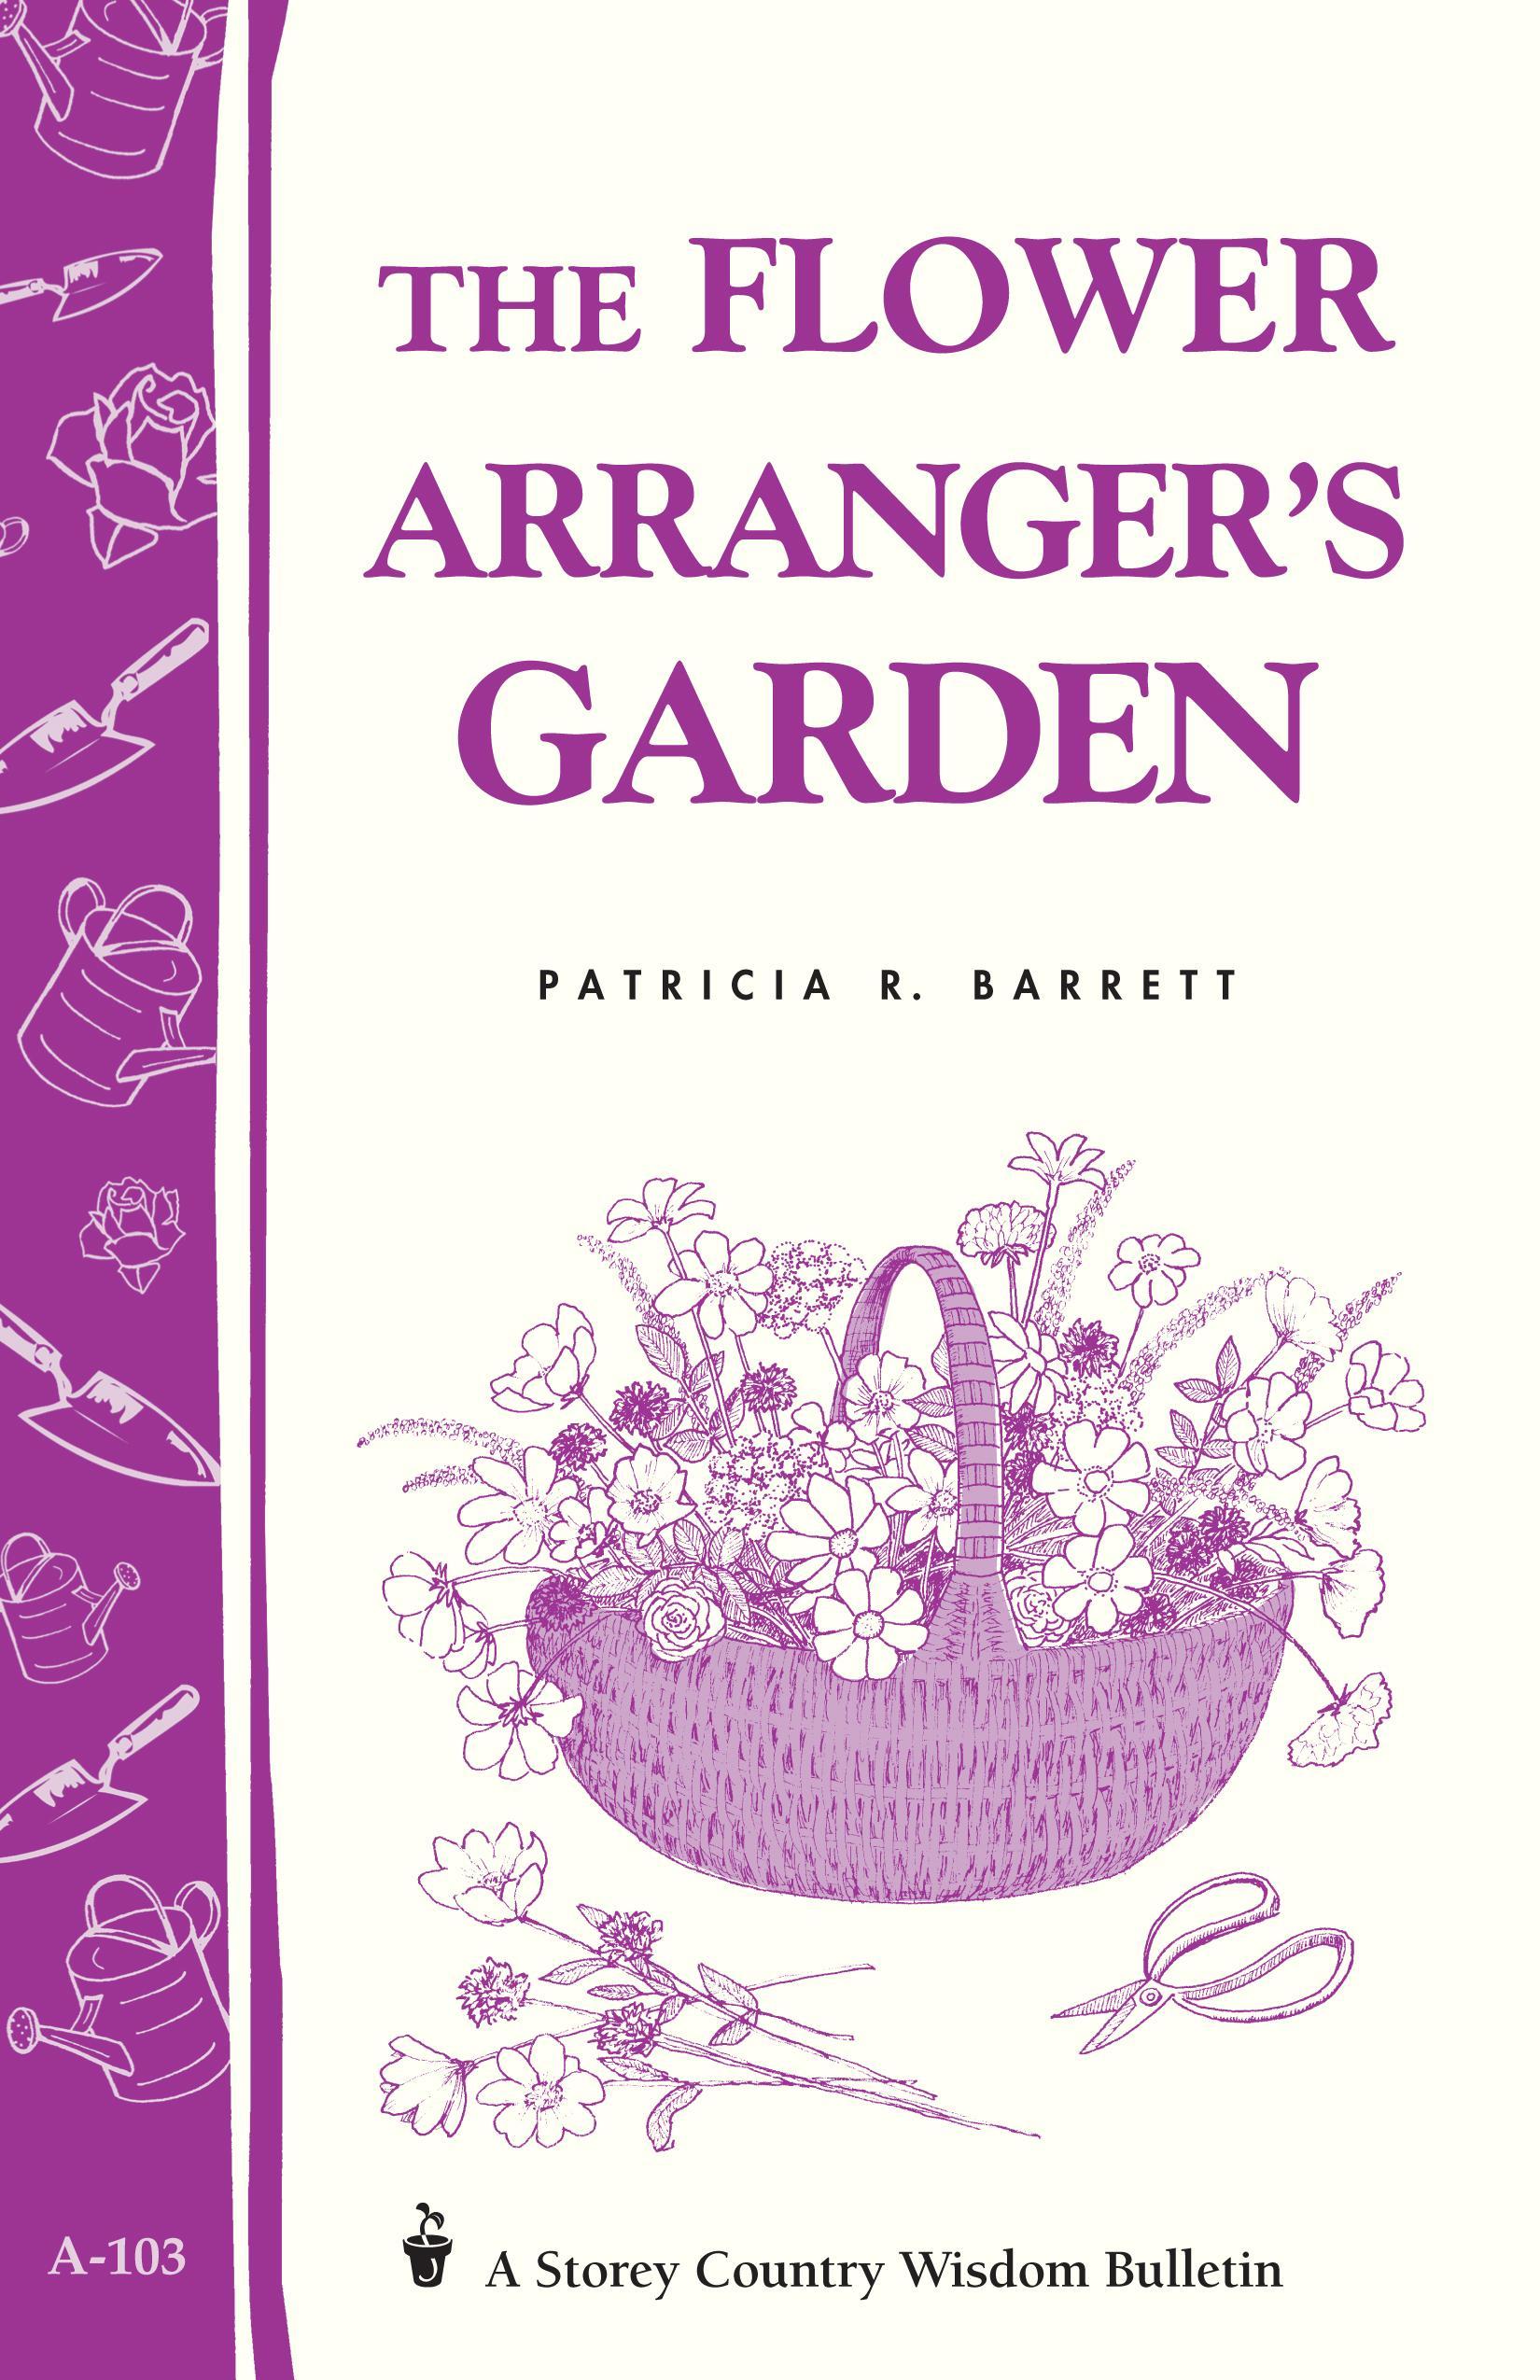 The Flower Arranger's Garden: Storey's Country Wisdom Bulletin A-103 EB9781603422543